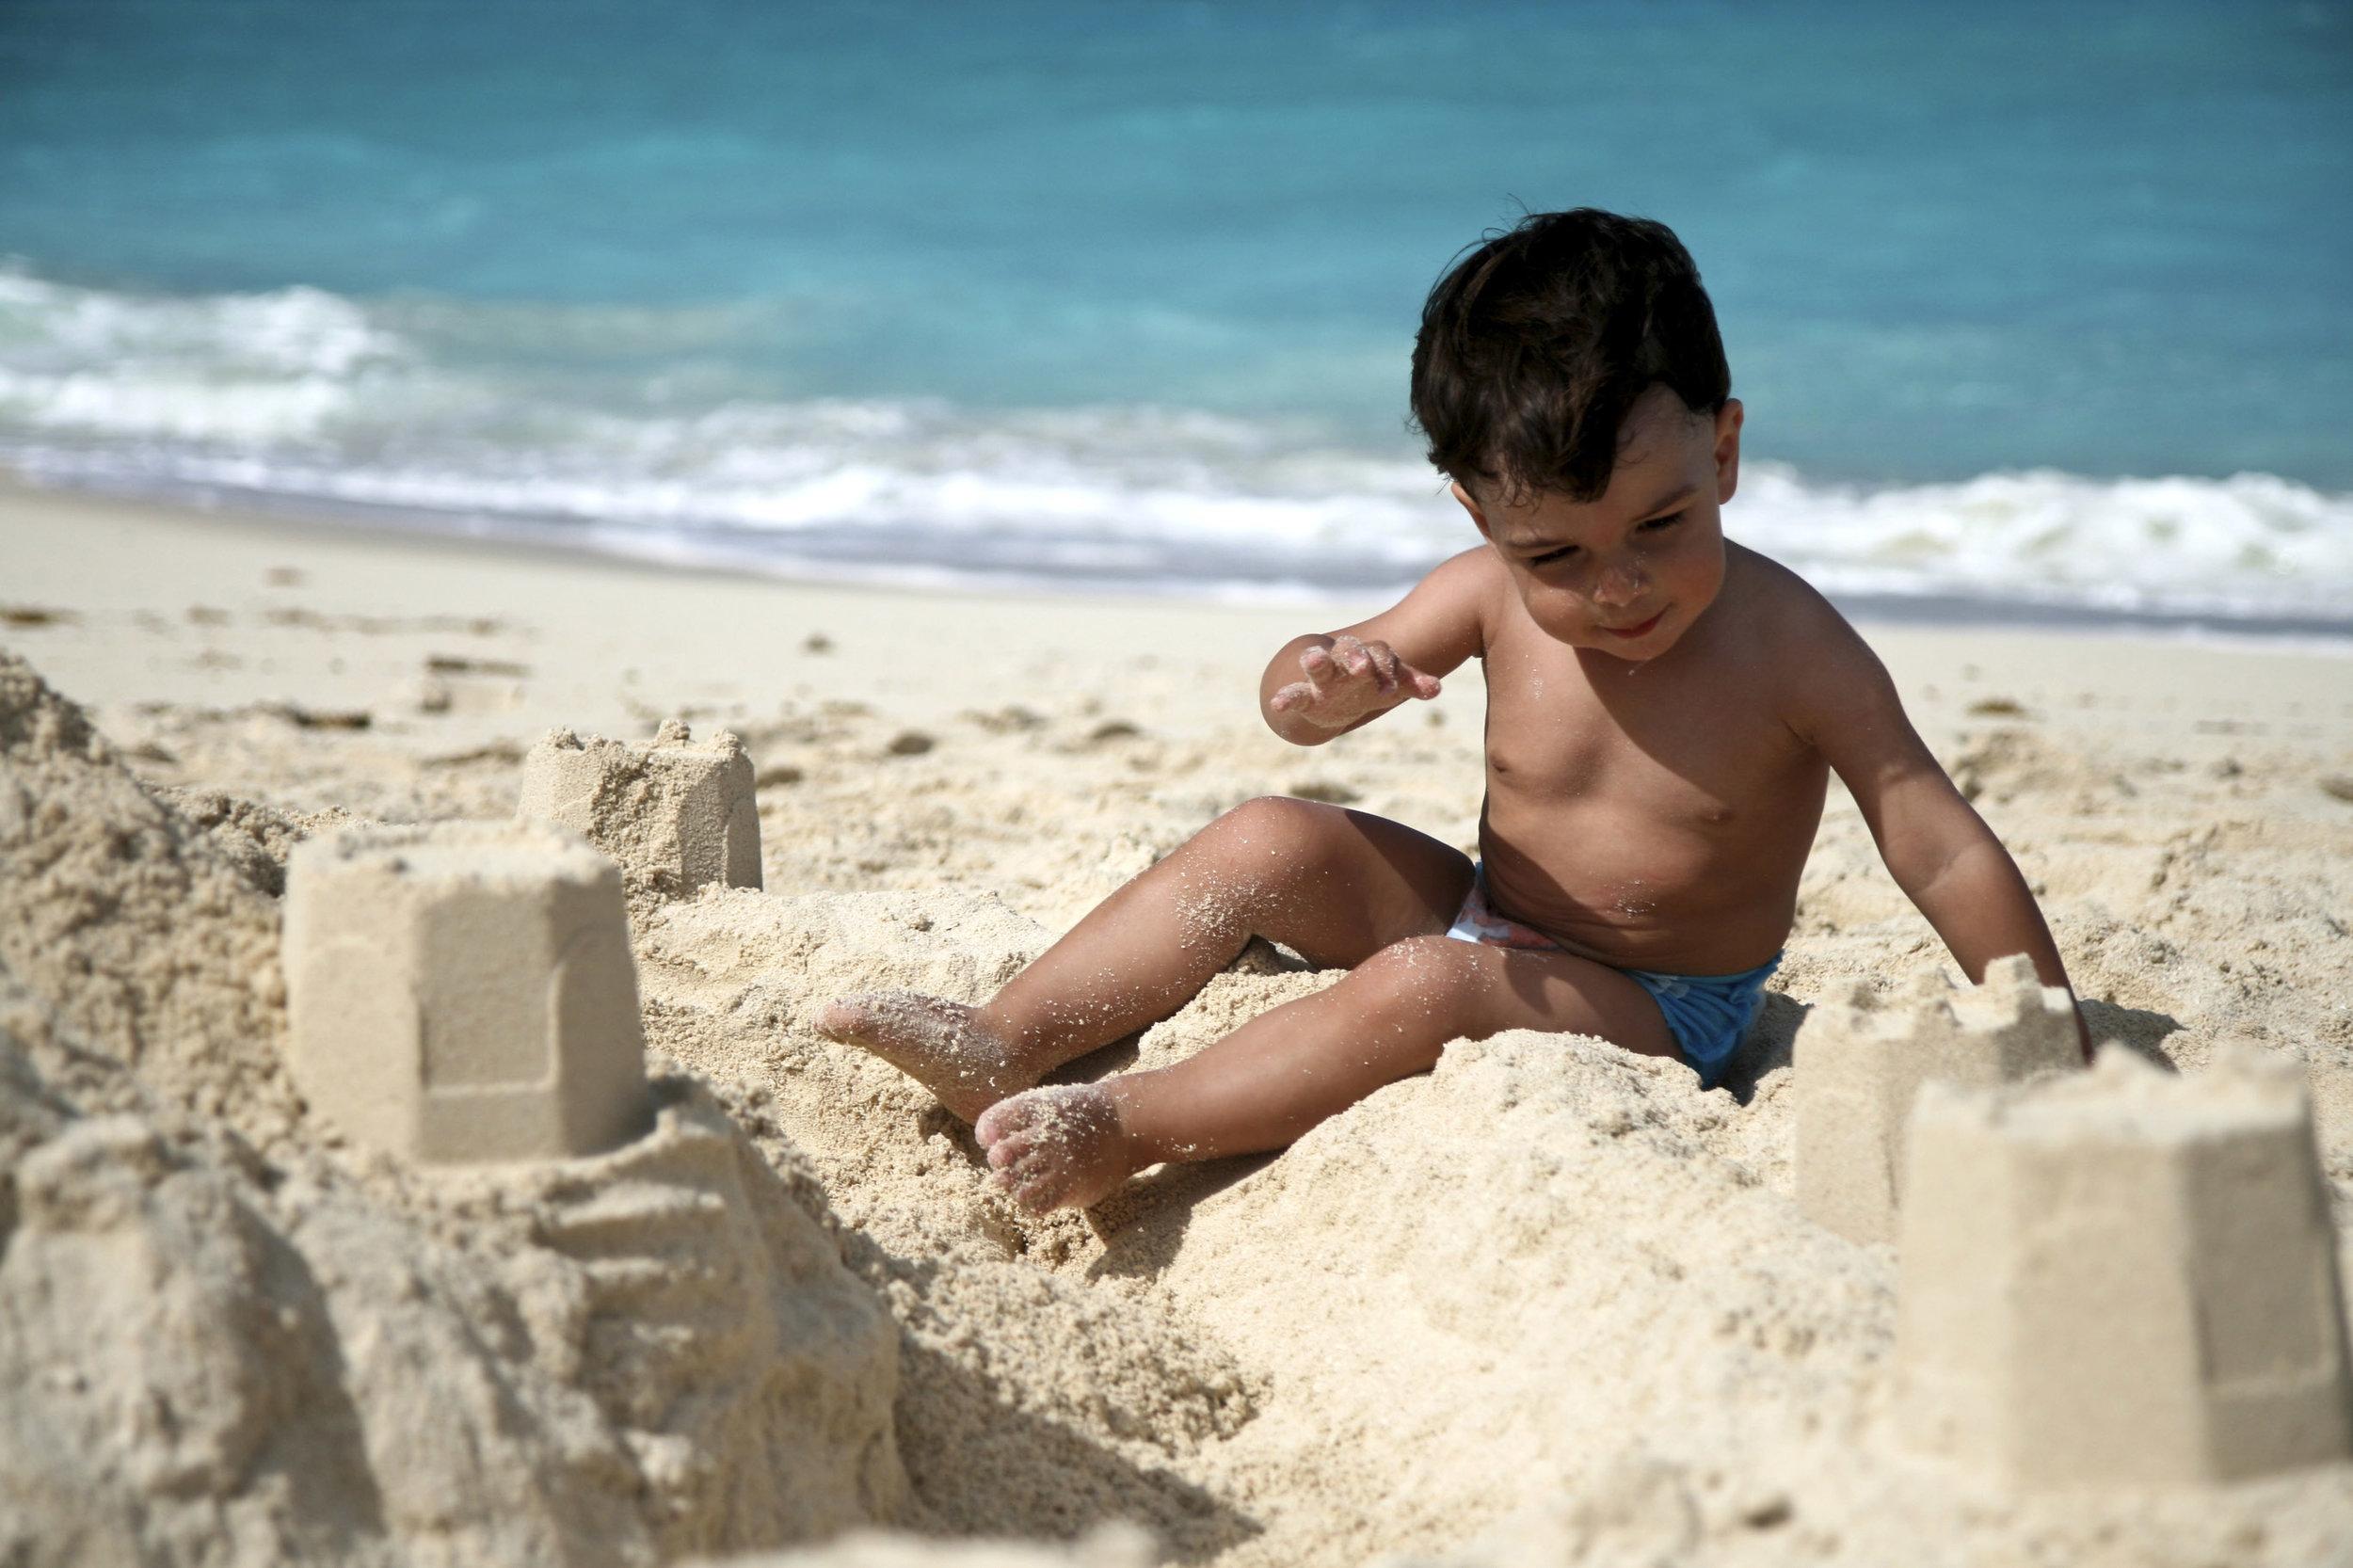 dreamstime_l_9279466 toddler on beach.jpg